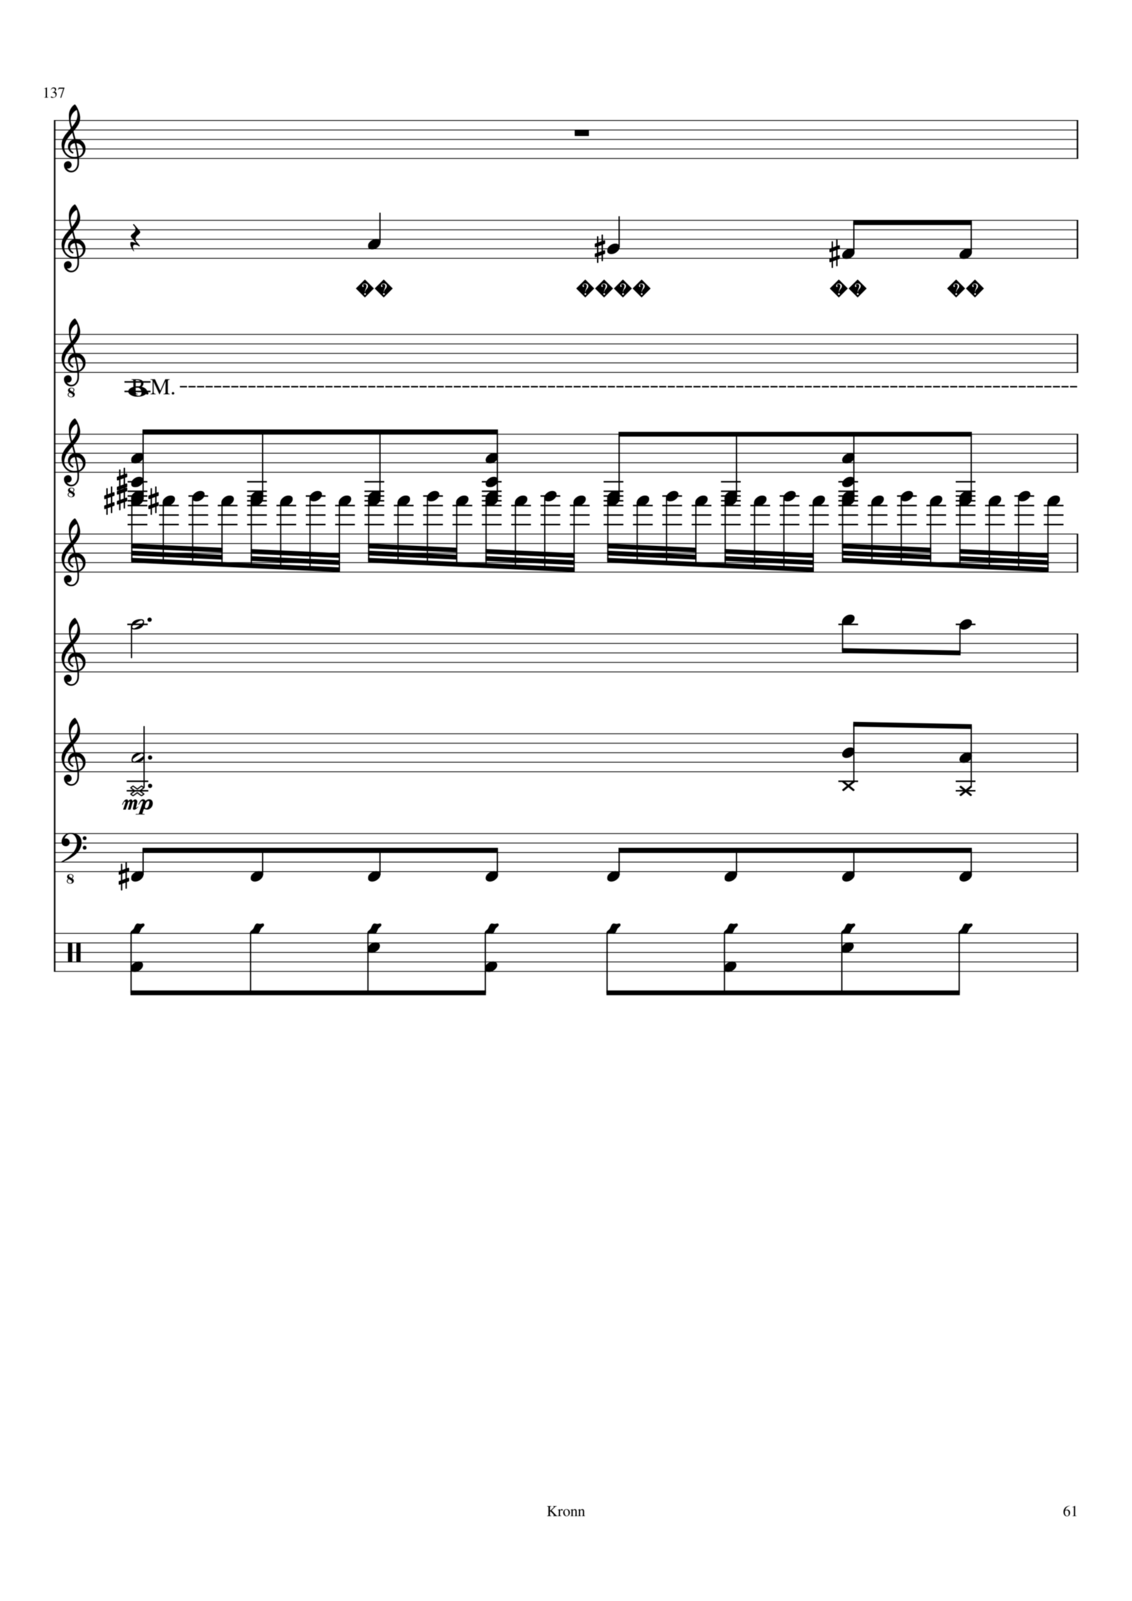 Ispoved Pervogo Boga slide, Image 61